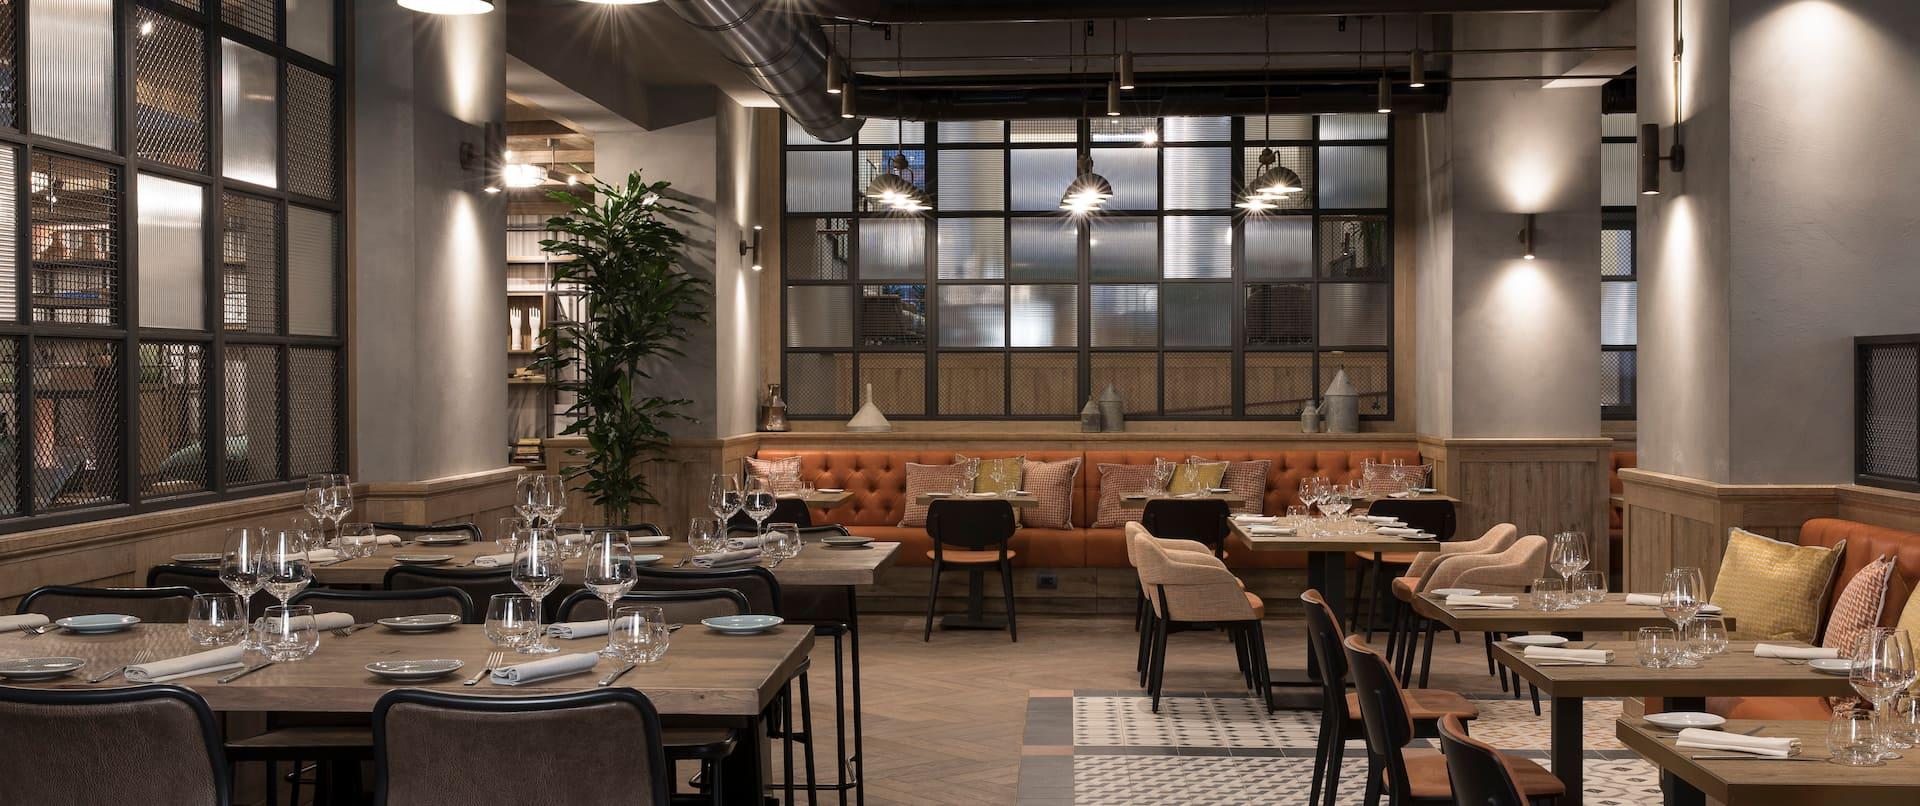 Mamalia restaurant dining seating area